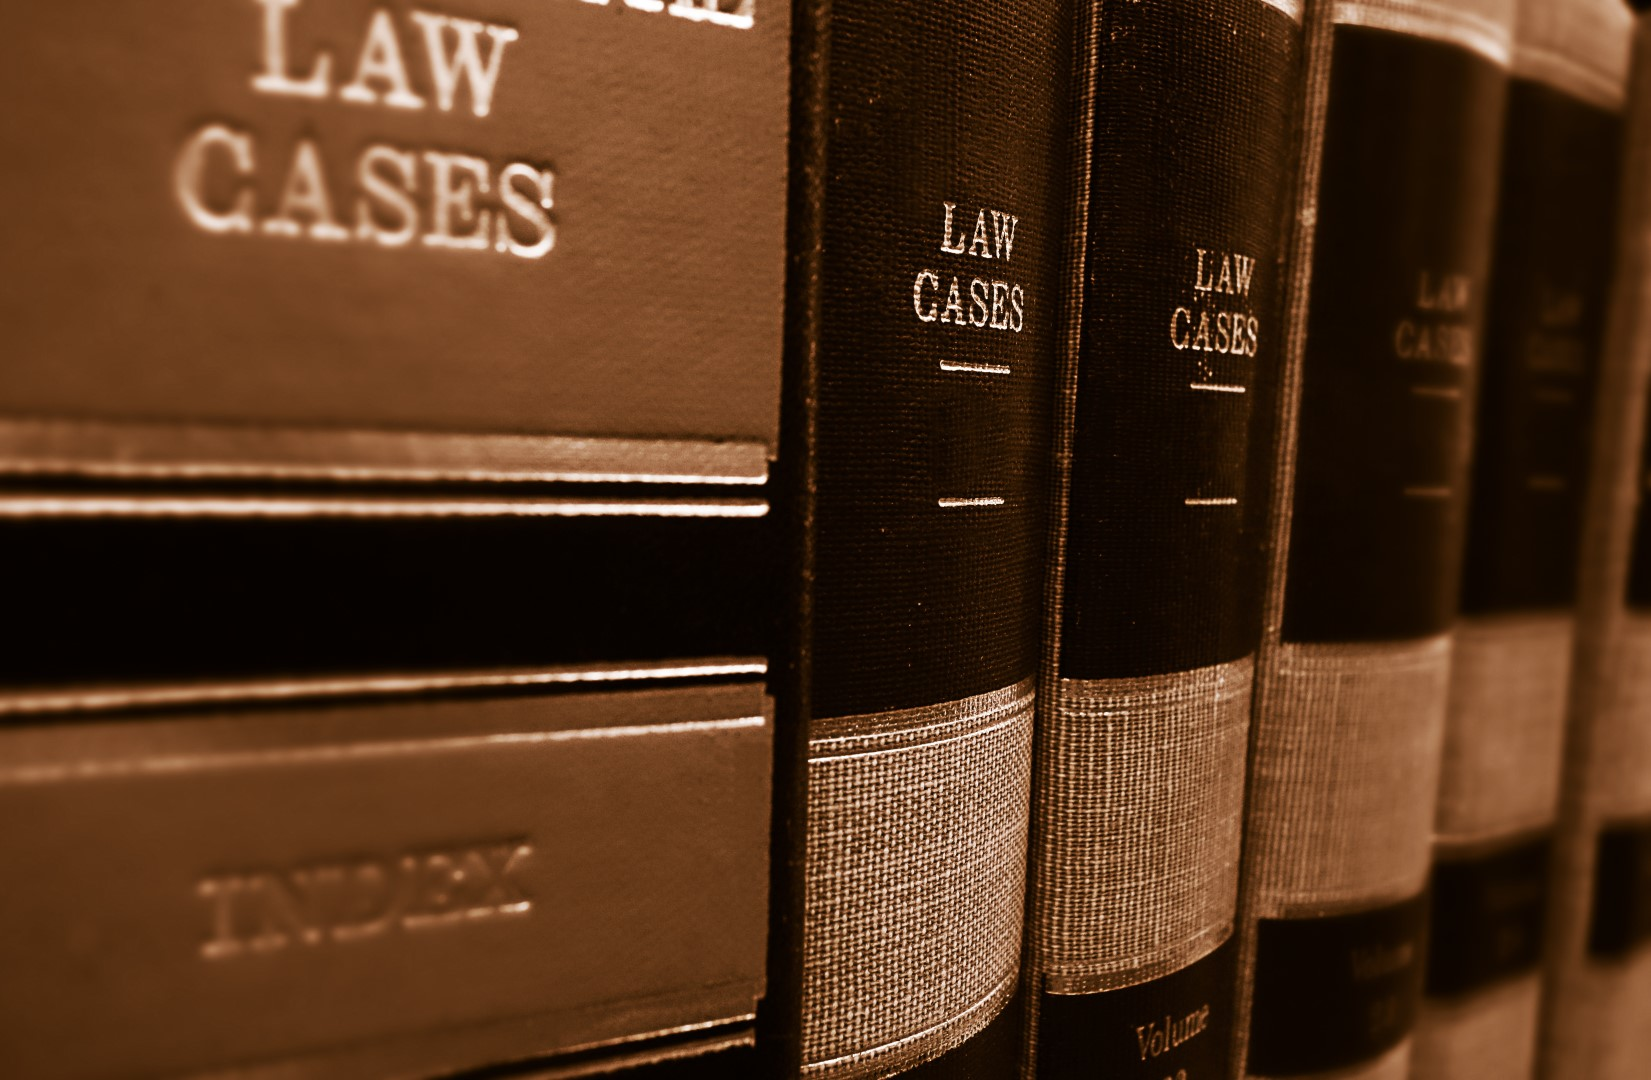 lawsuits-Large.jpg